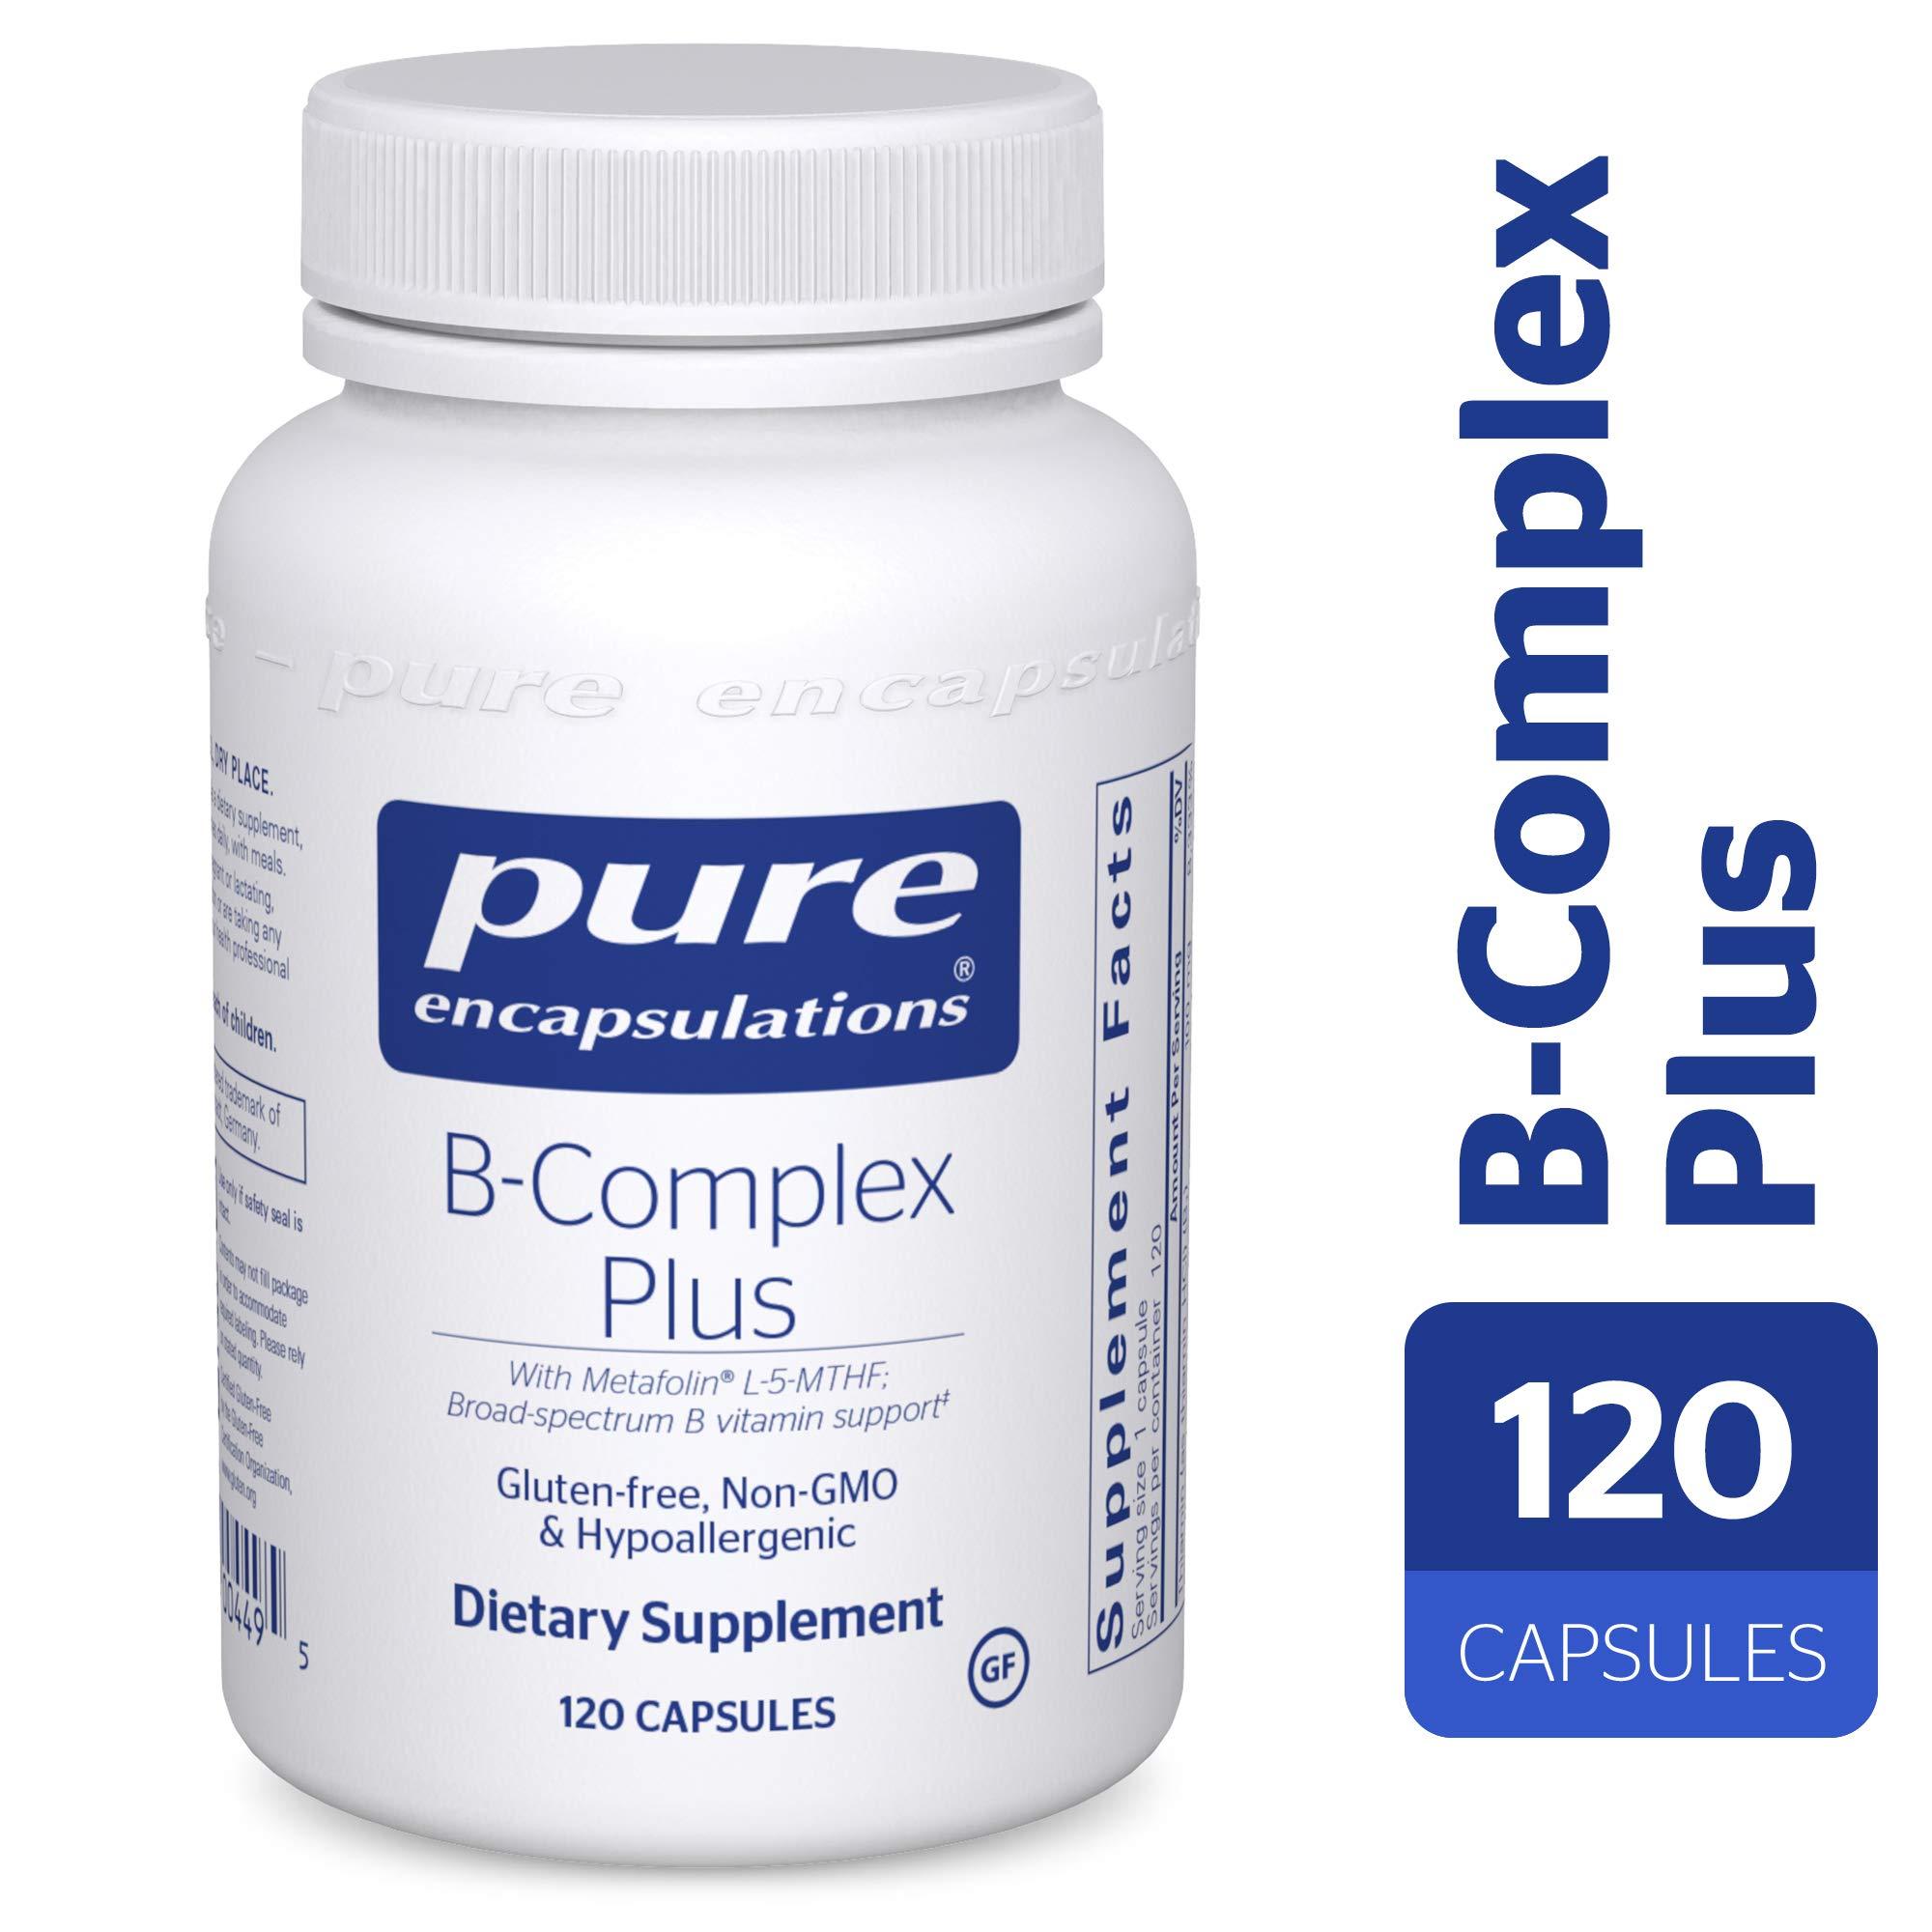 Pure Encapsulations - B-Complex Plus - Balanced B Vitamin Formula with Metafolin® L-5-MTHF and Vitamin B12-120 Capsules